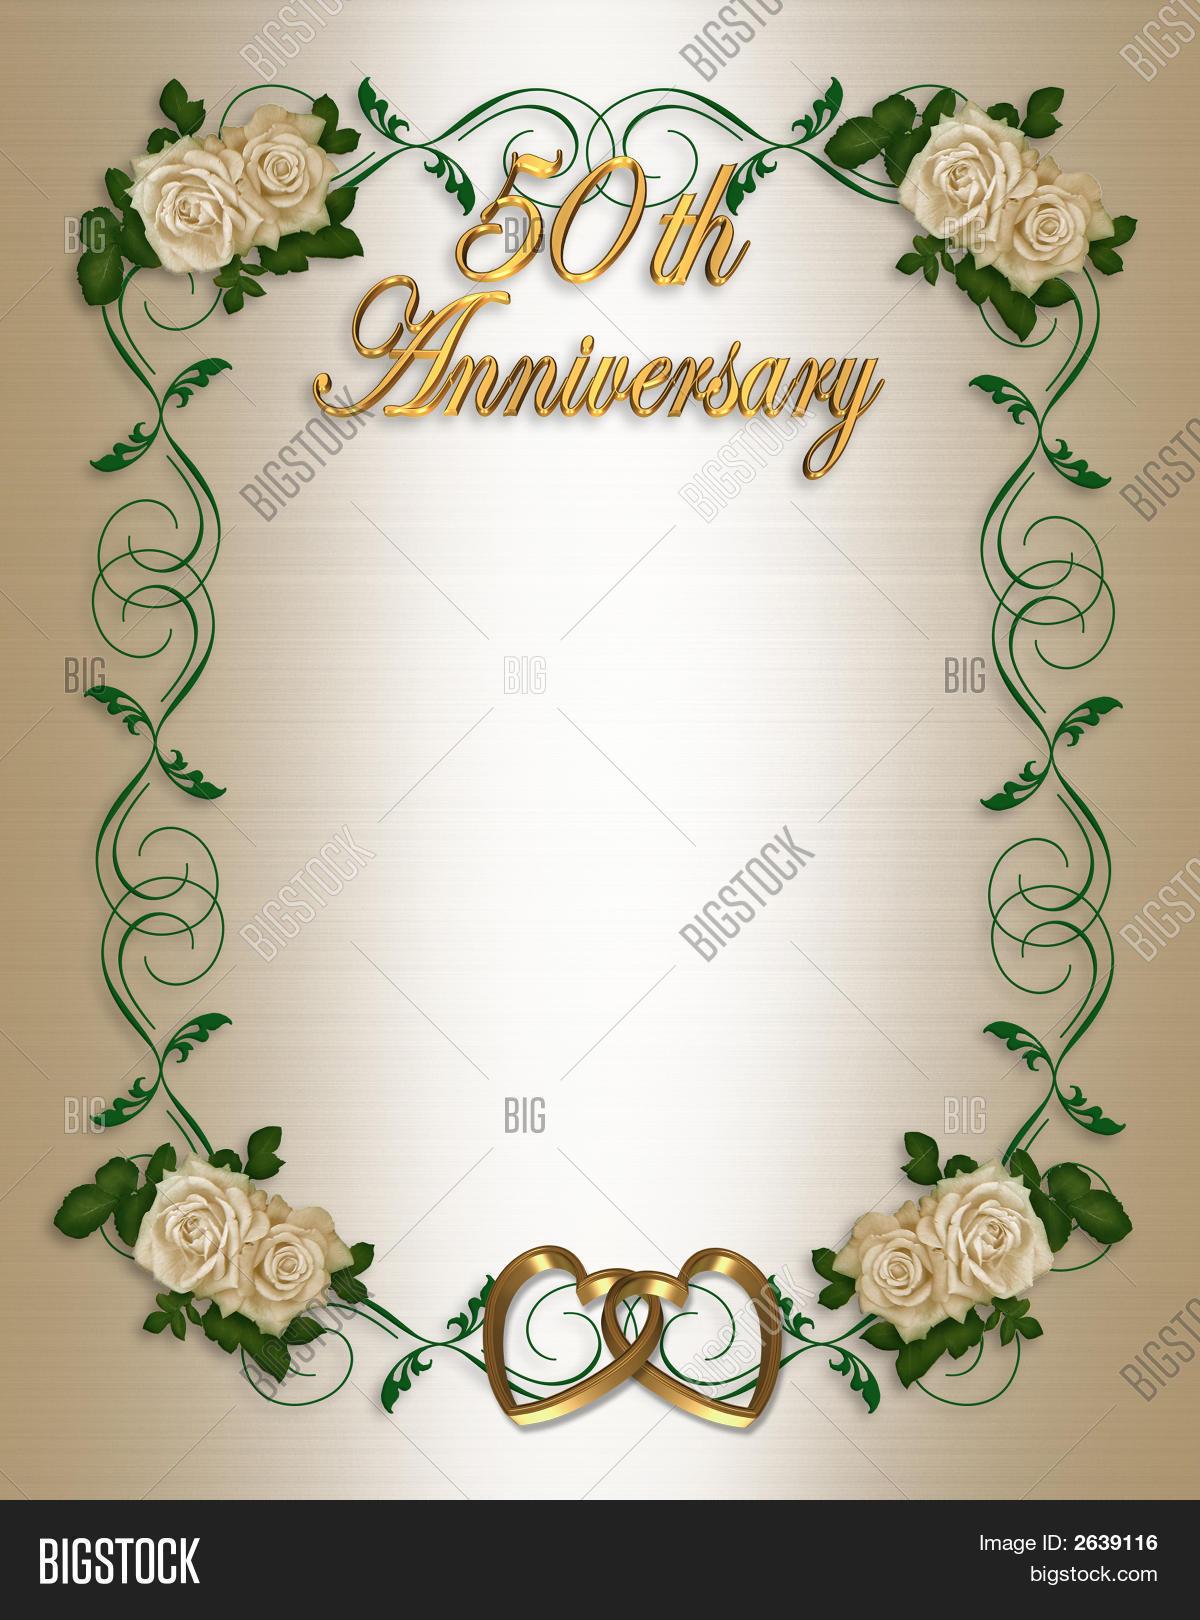 50Th Wedding Anniversary Invitation Image & Photo   Bigstock